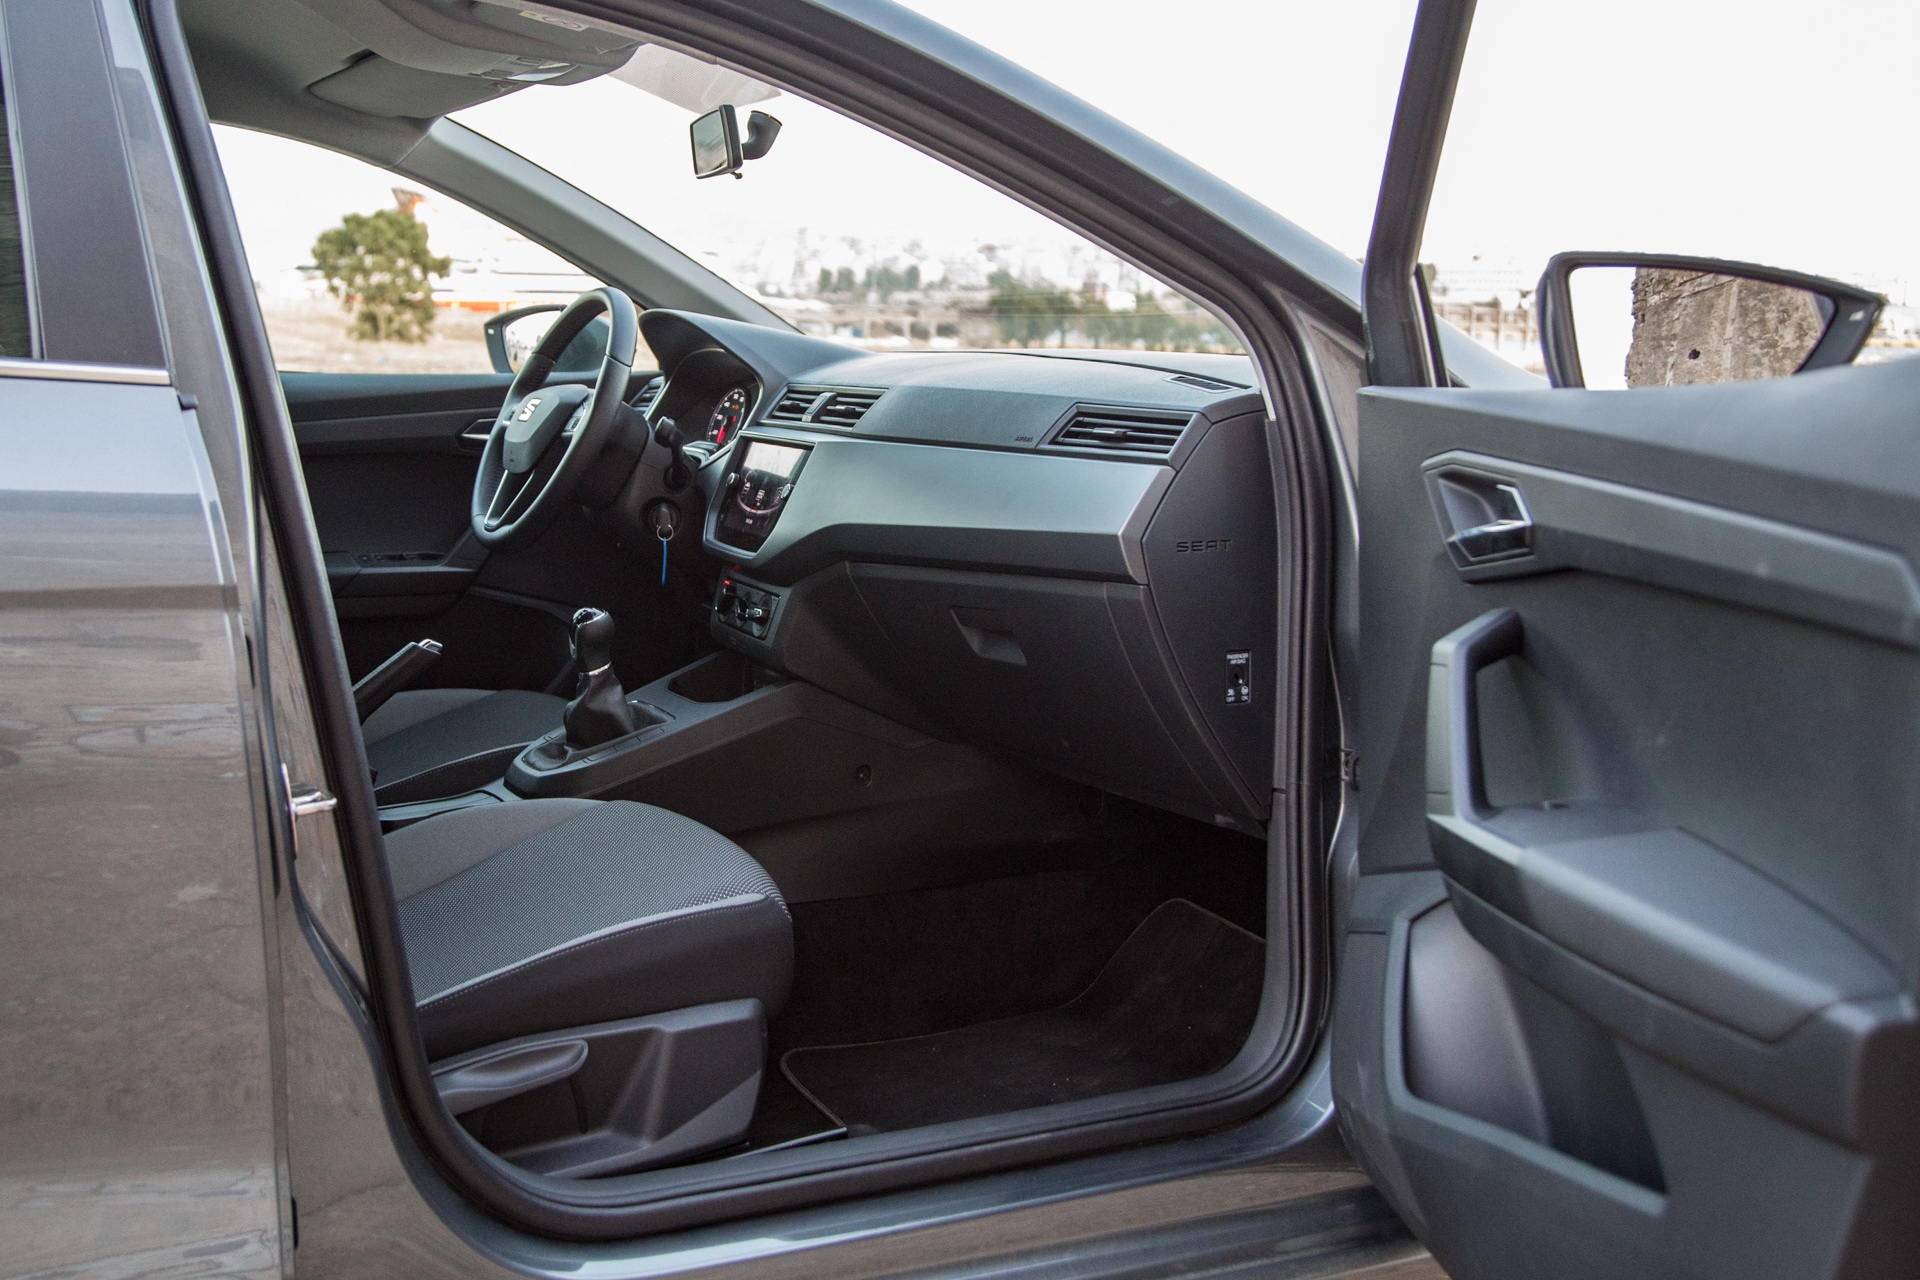 Test_Drive_Seat_Ibiza_1.0_35